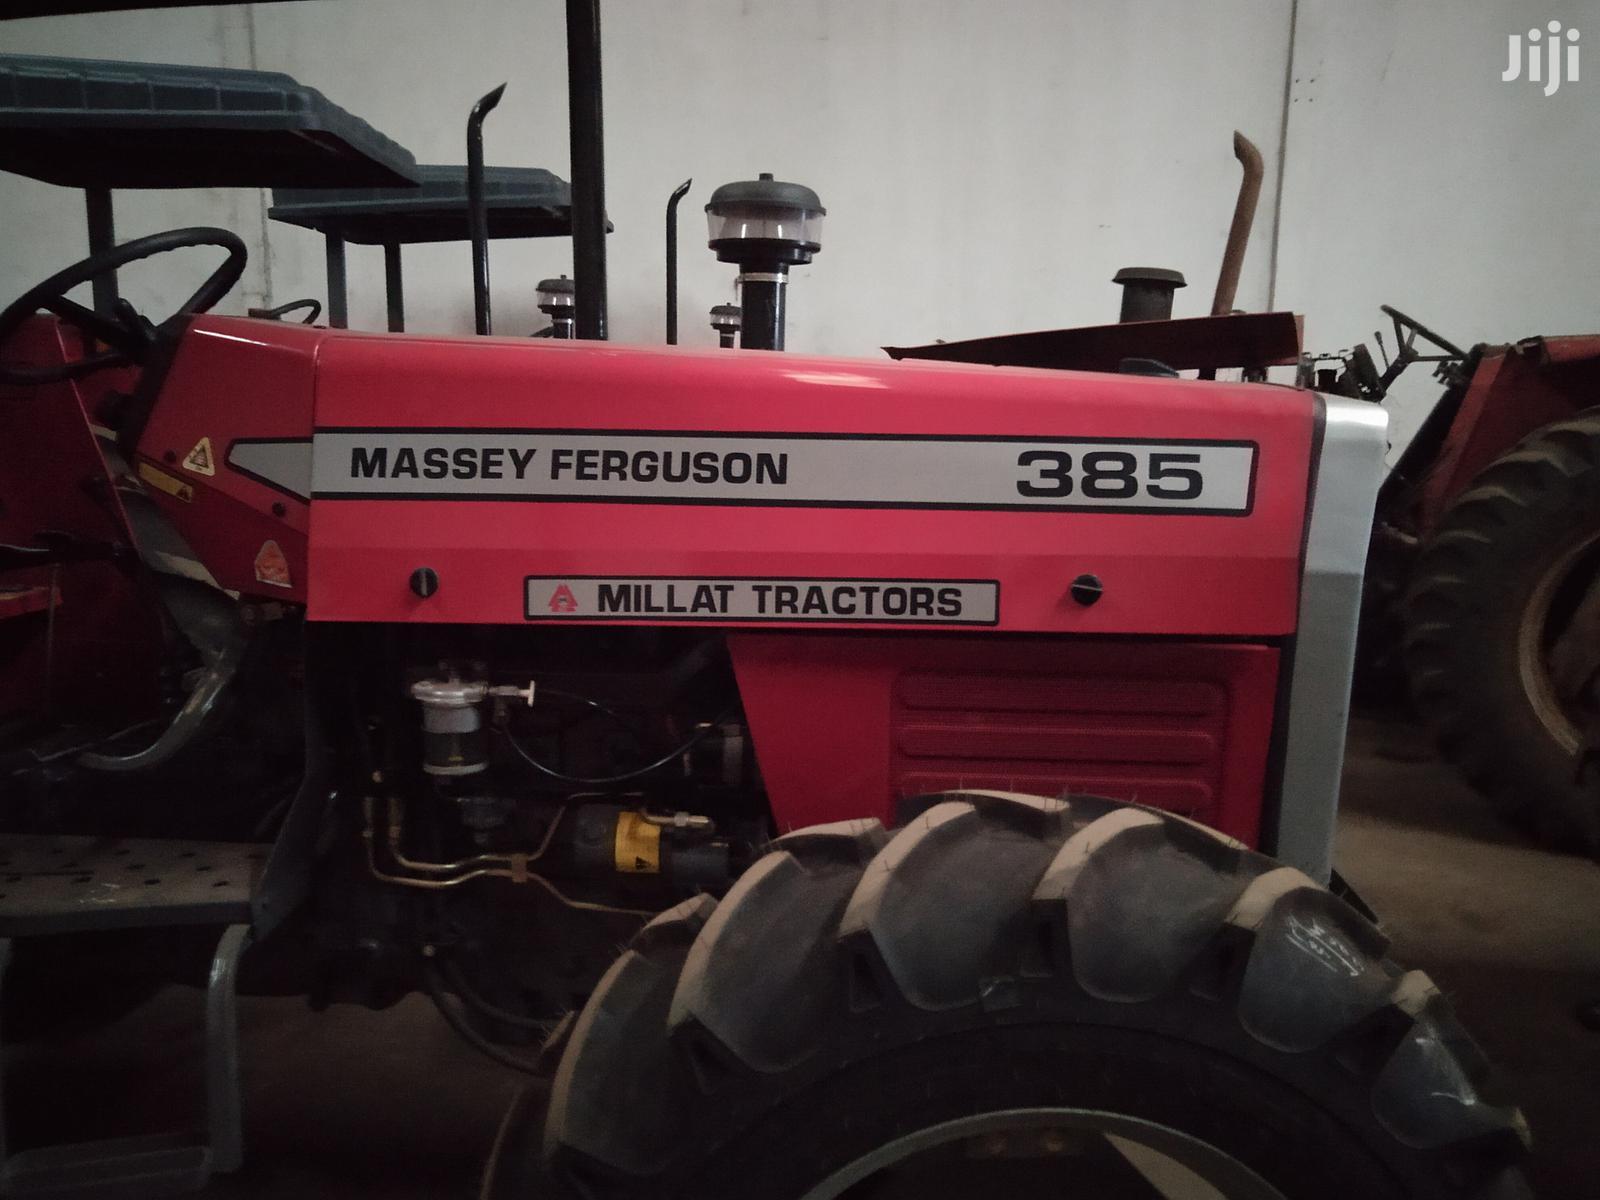 Massey Ferguson 385 (4WD)